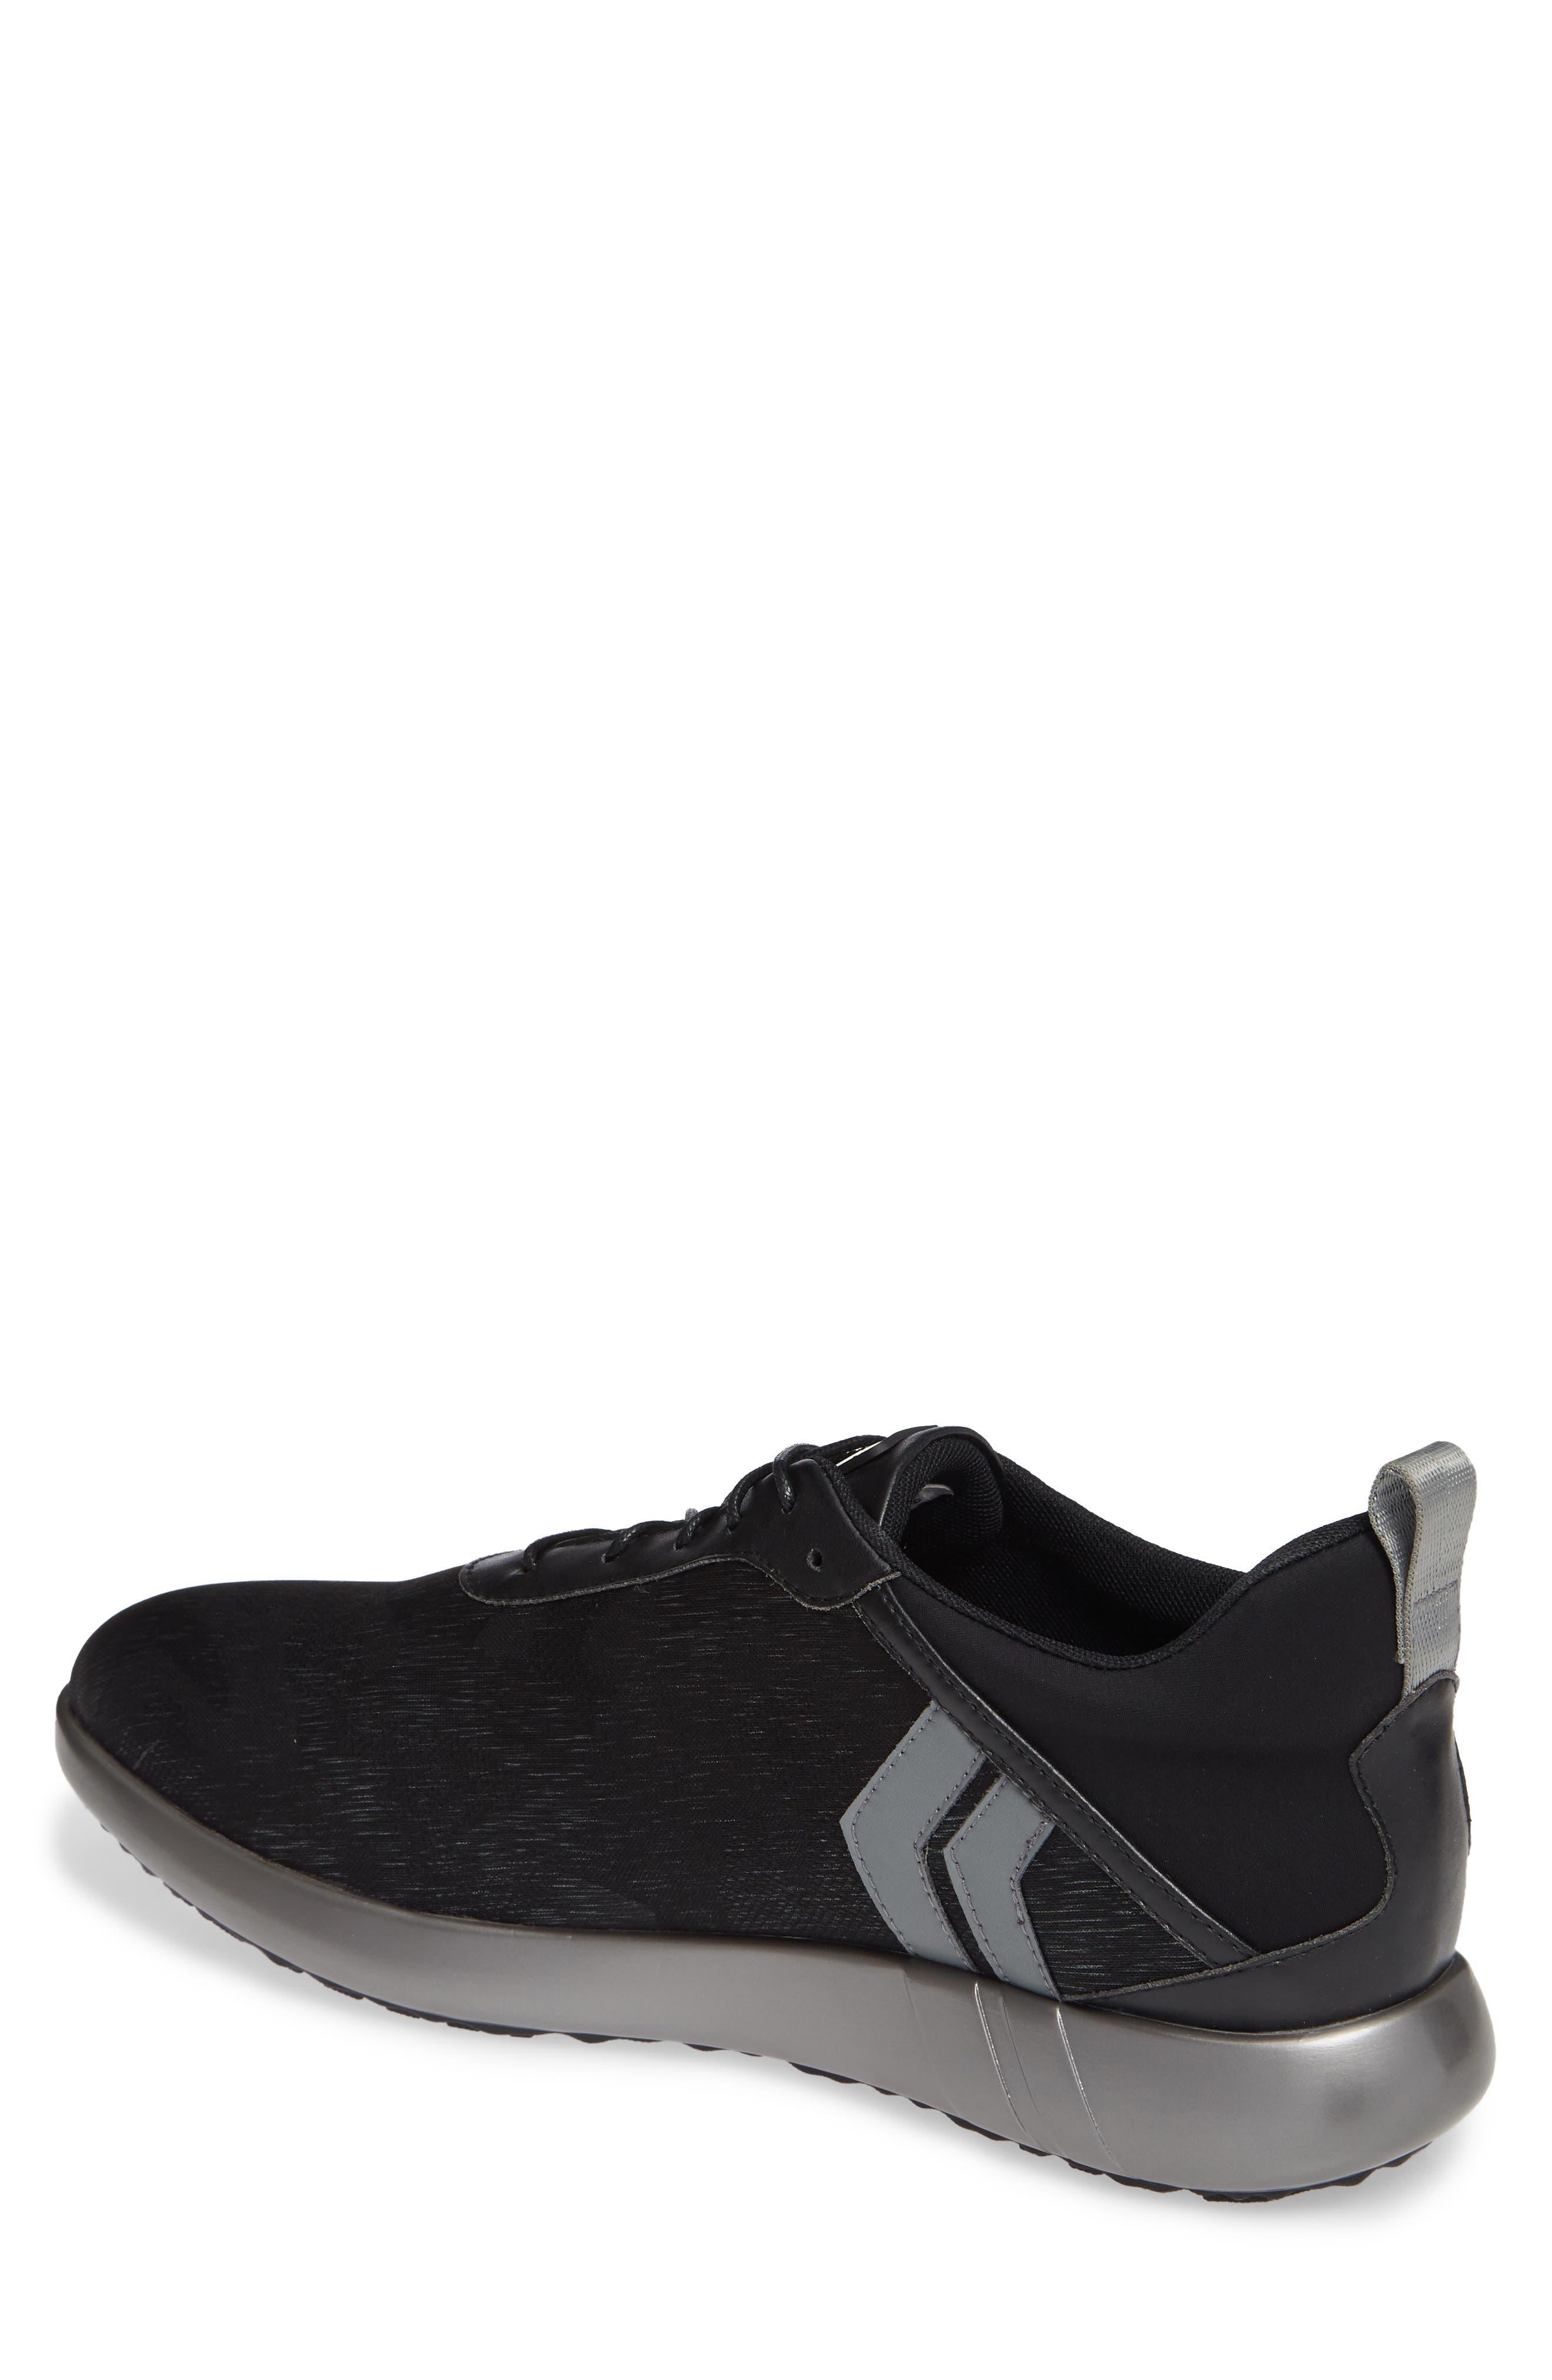 Haze Sneaker,                             Alternate thumbnail 2, color,                             021